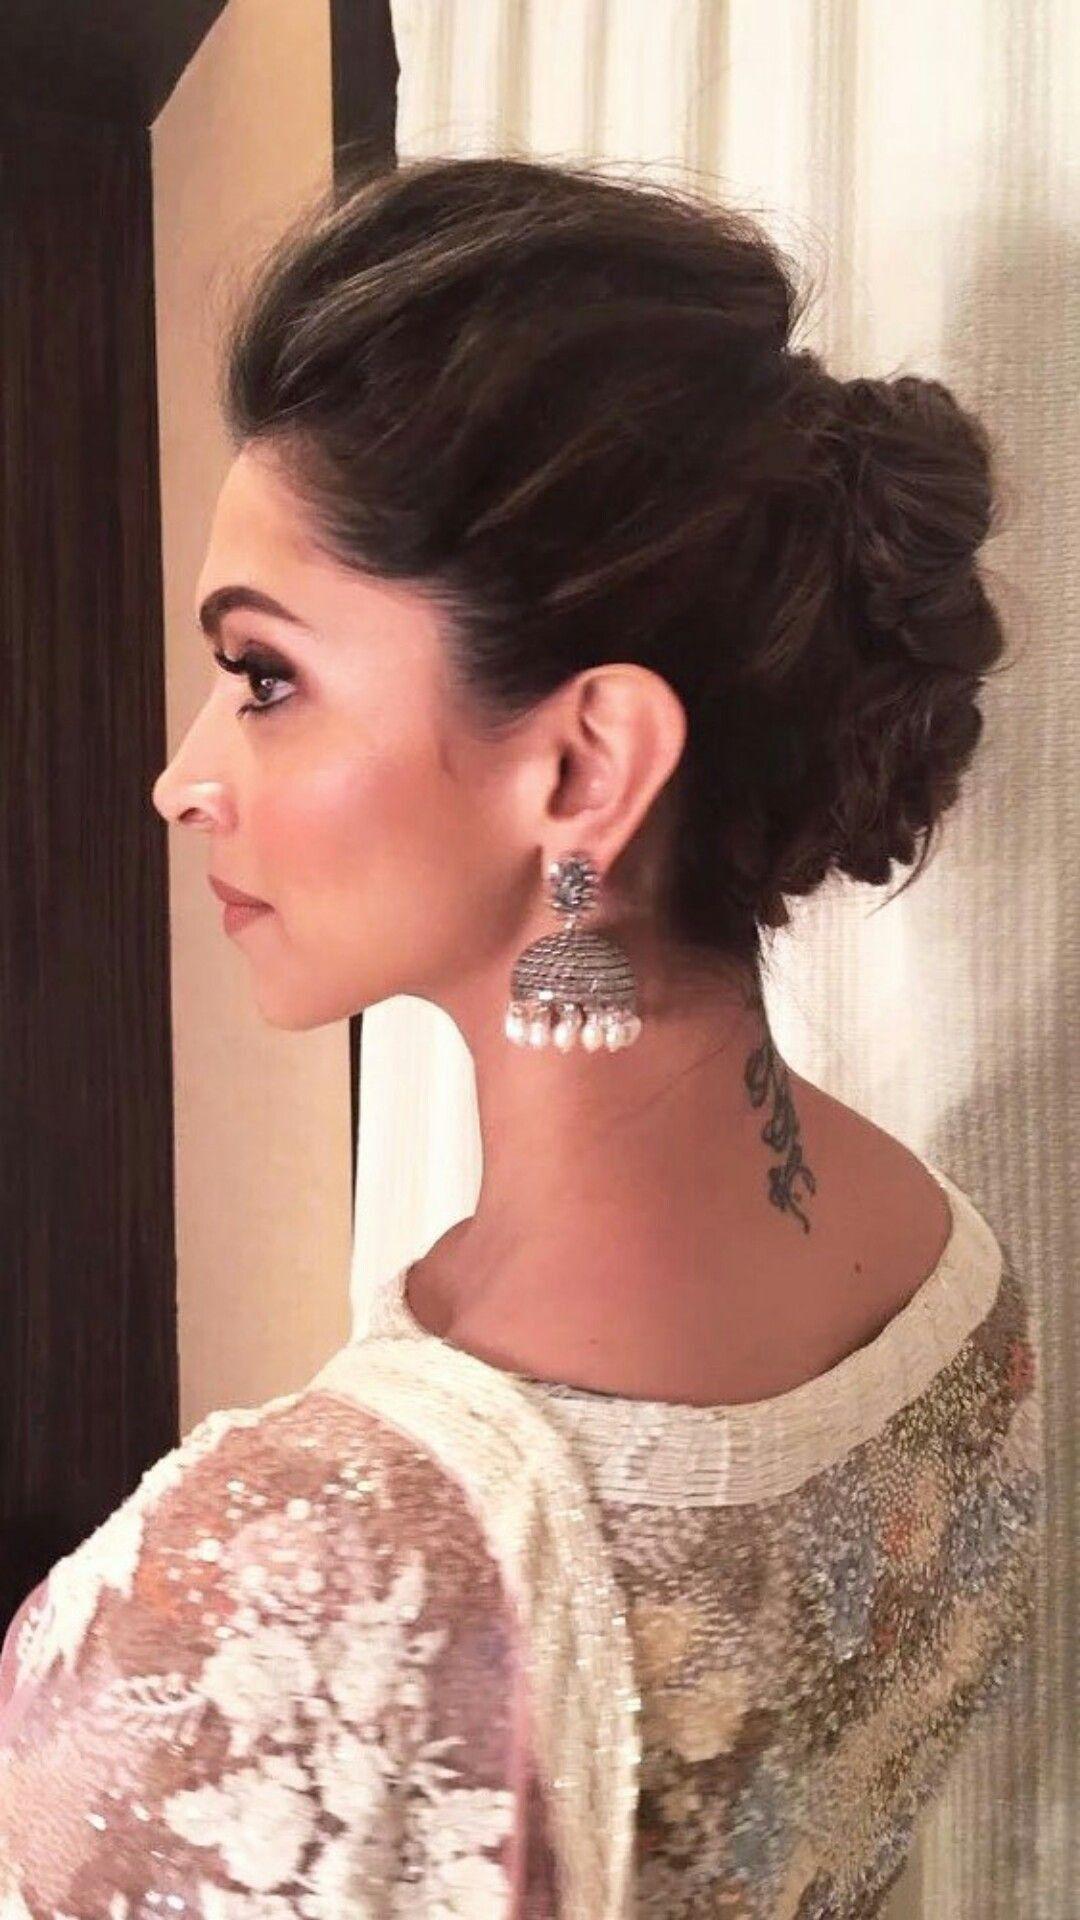 Wedding Hairstyles For Medium Hair Indian Trumpet 55 Hairstyles For Indian Weddings Medium In 2020 Hair Styles Indian Hairstyles Indian Wedding Hairstyles